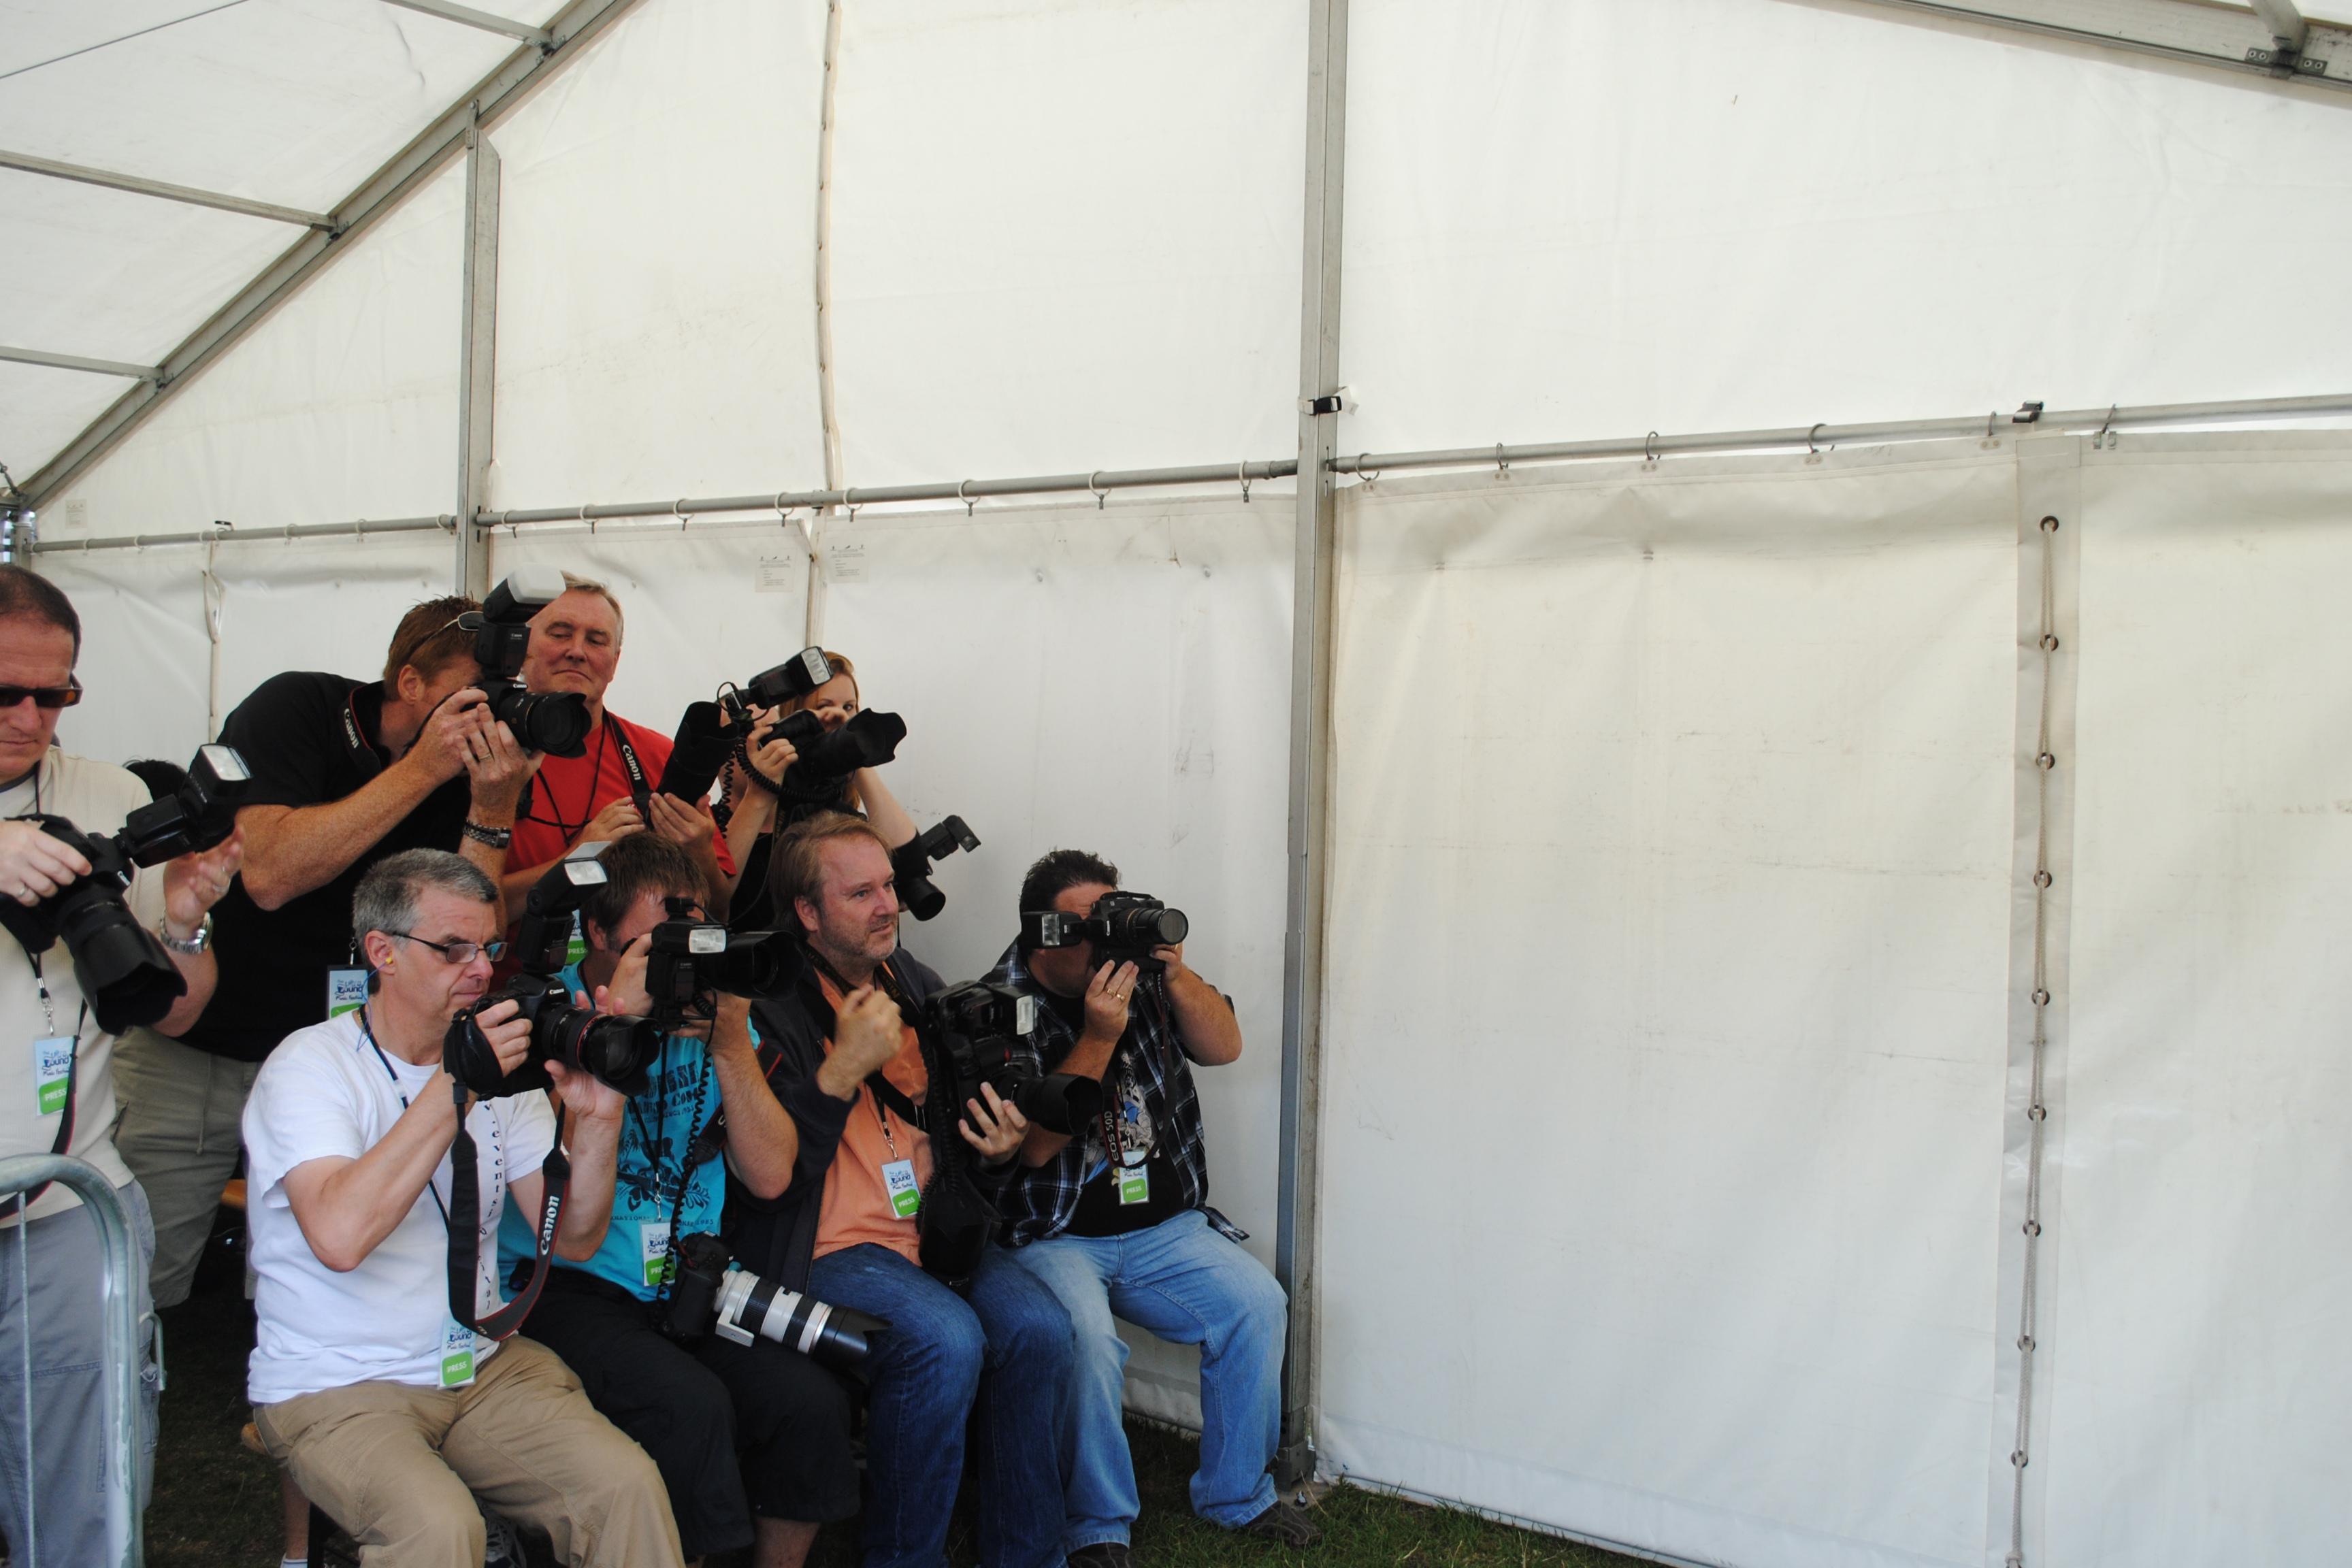 The Photographers